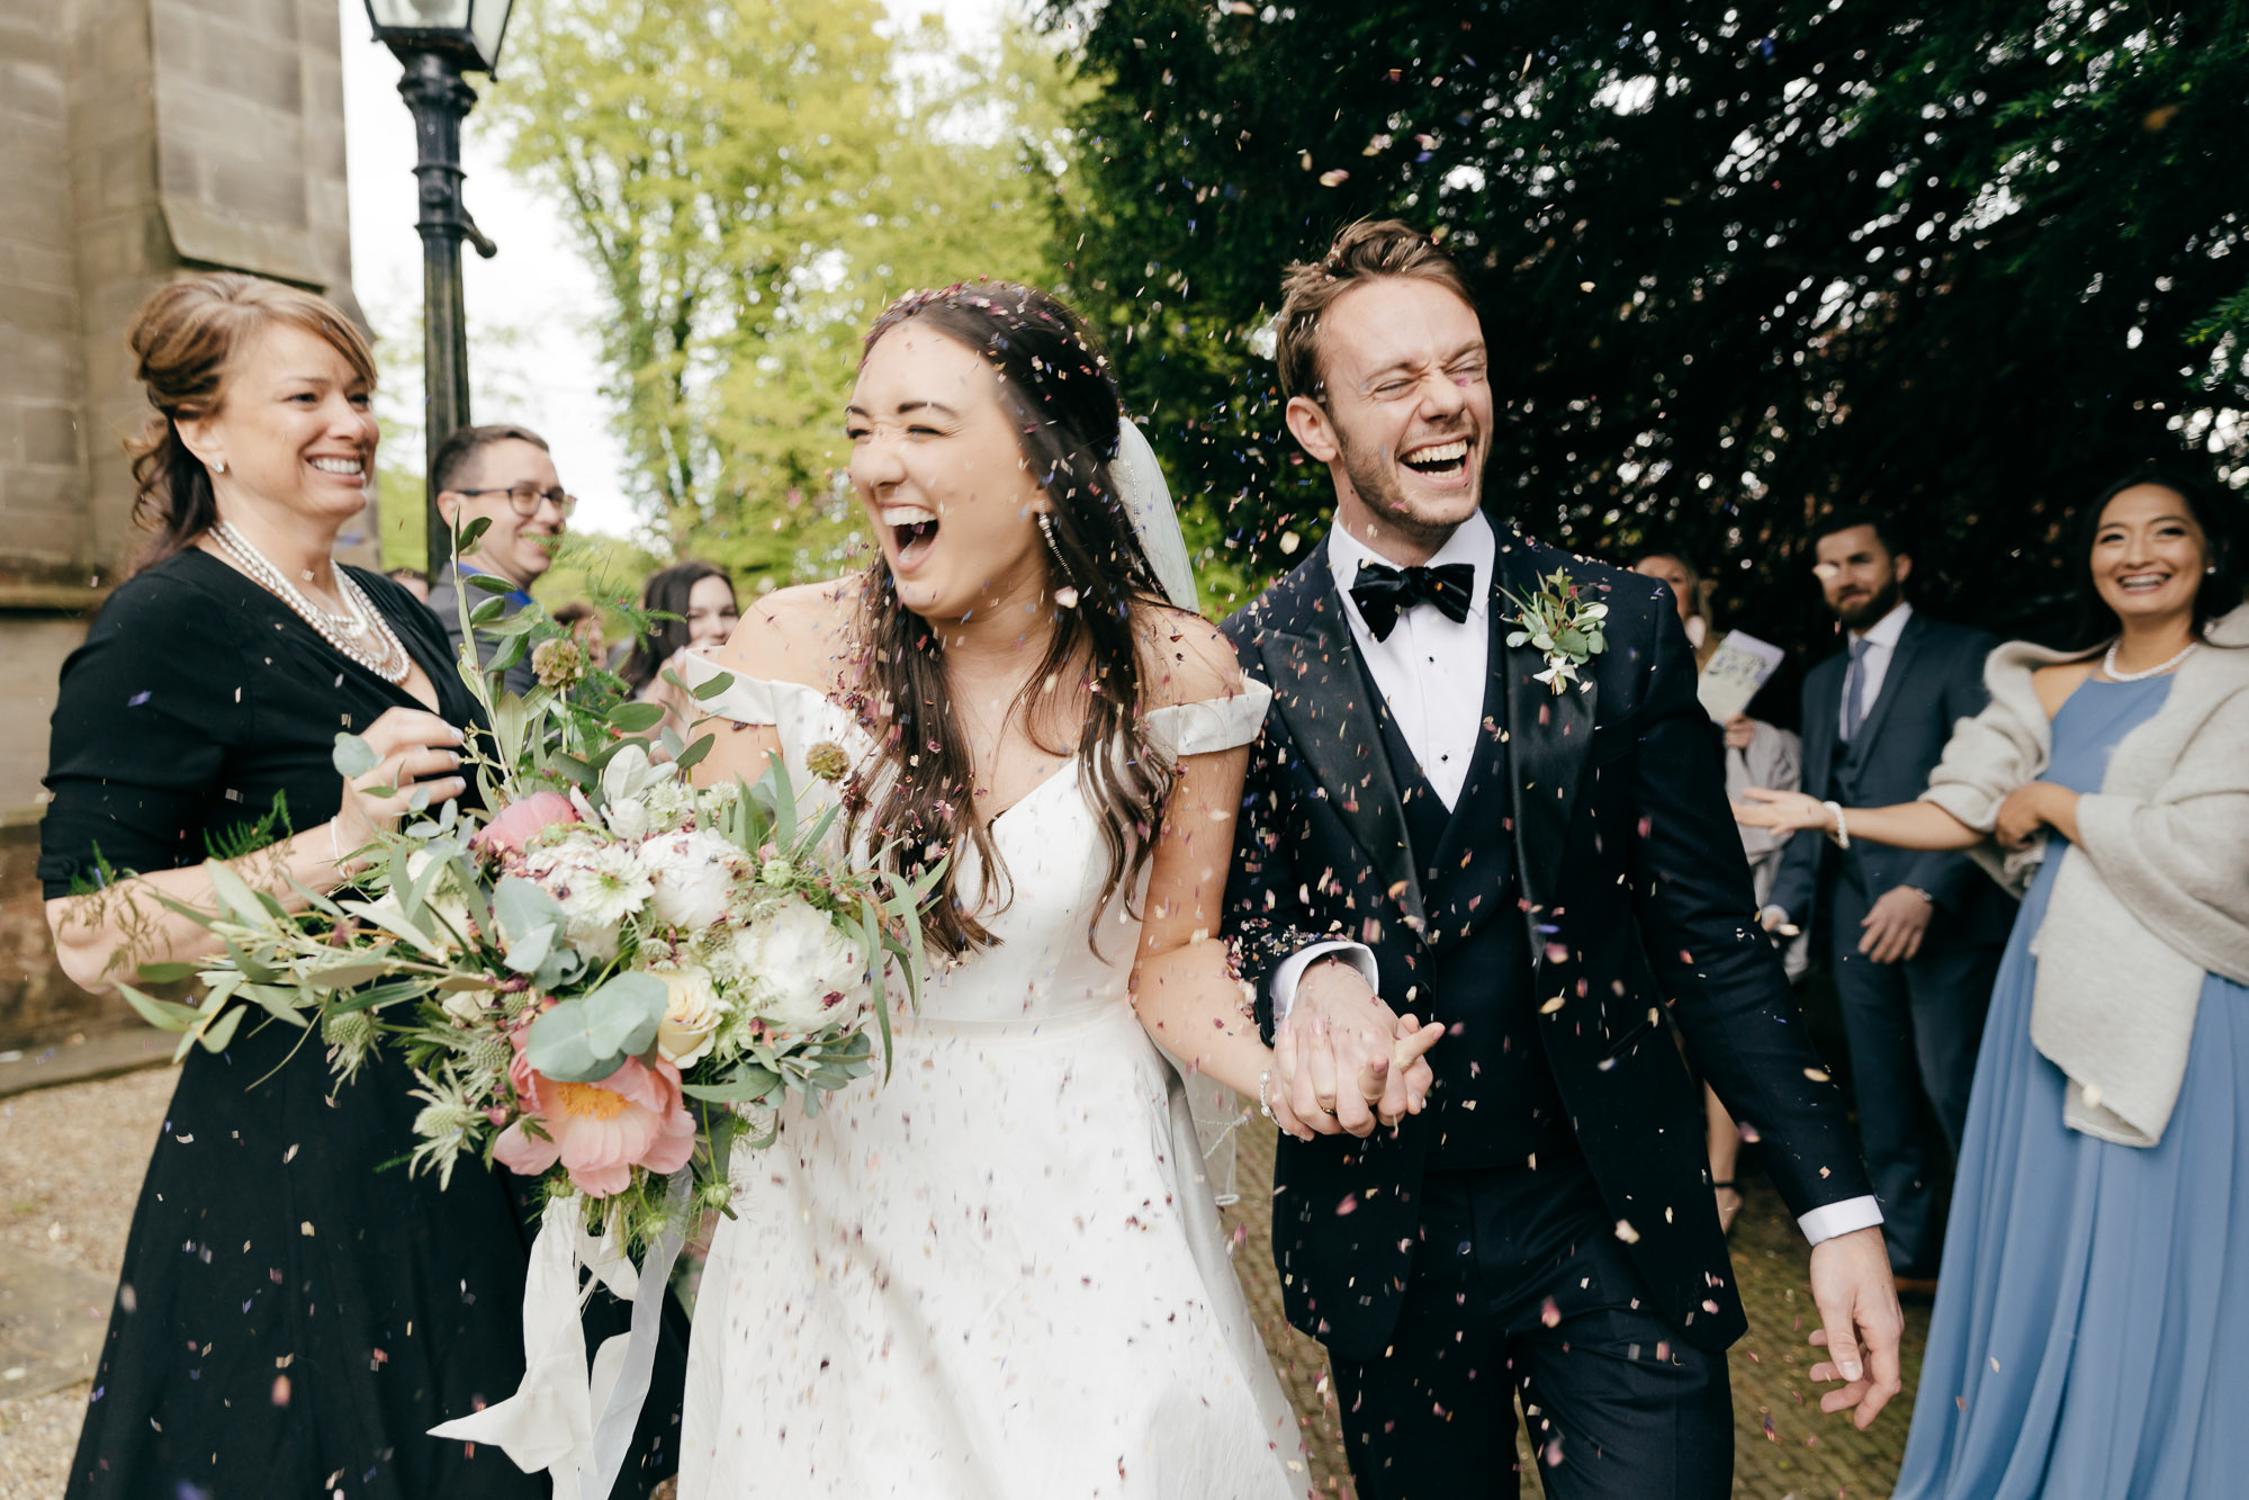 Fun joyful and natural wedding photo of confetti throw outside church